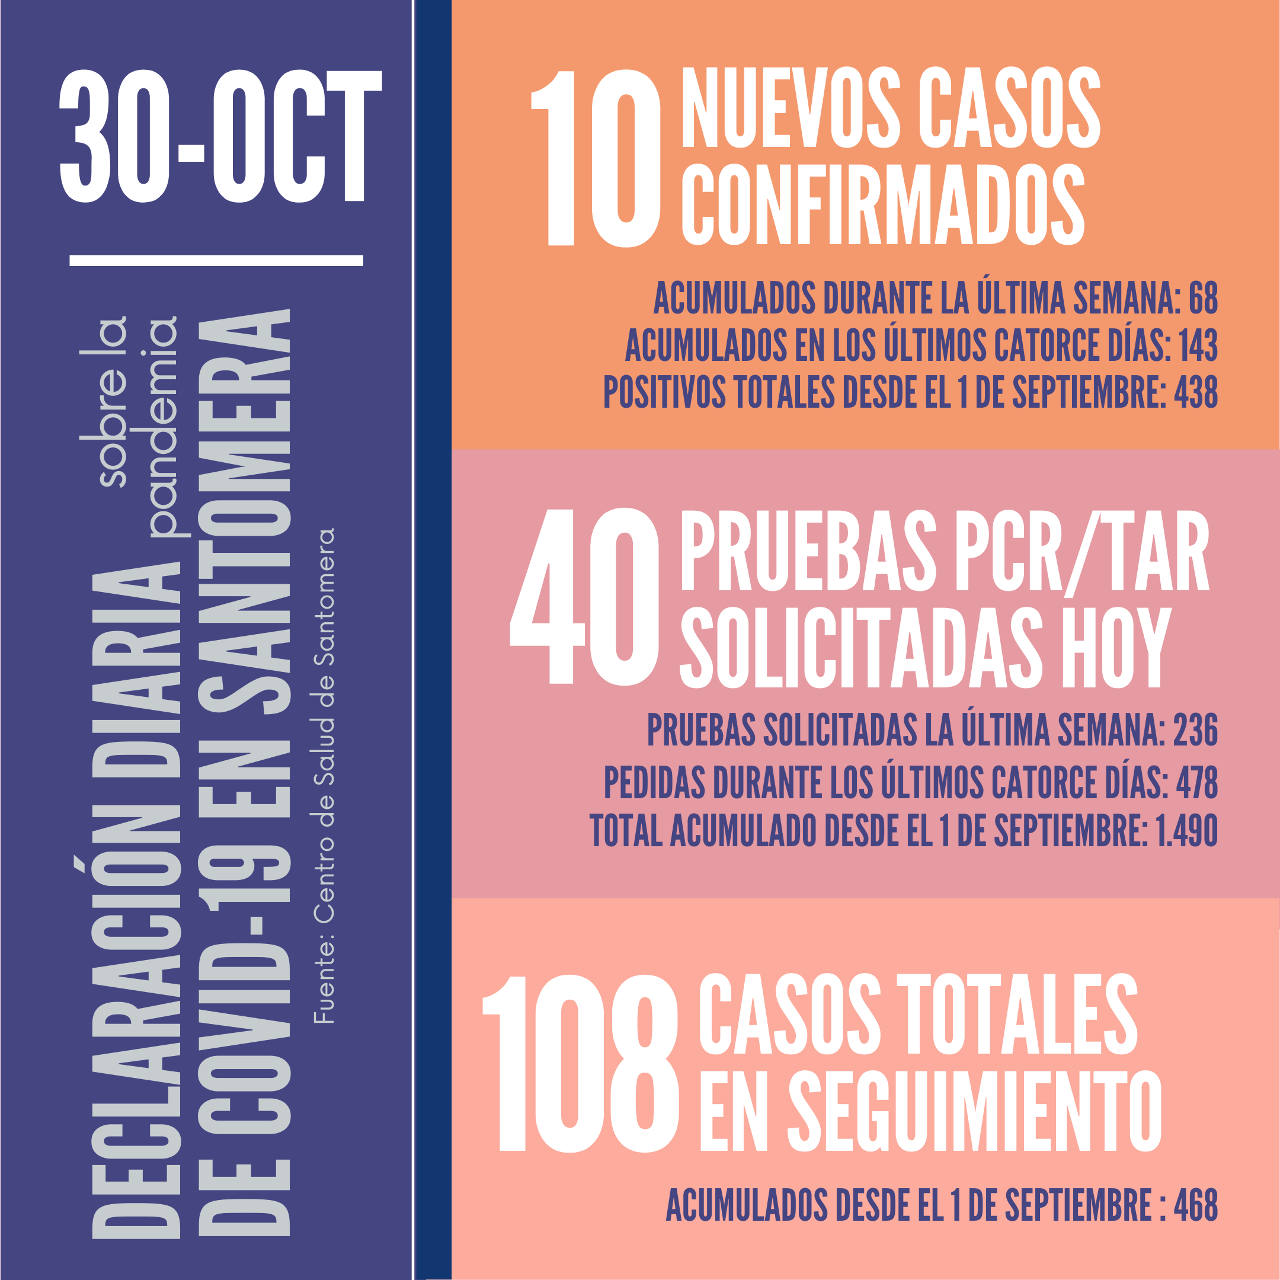 20201030_Datos COVID-19 Santomera